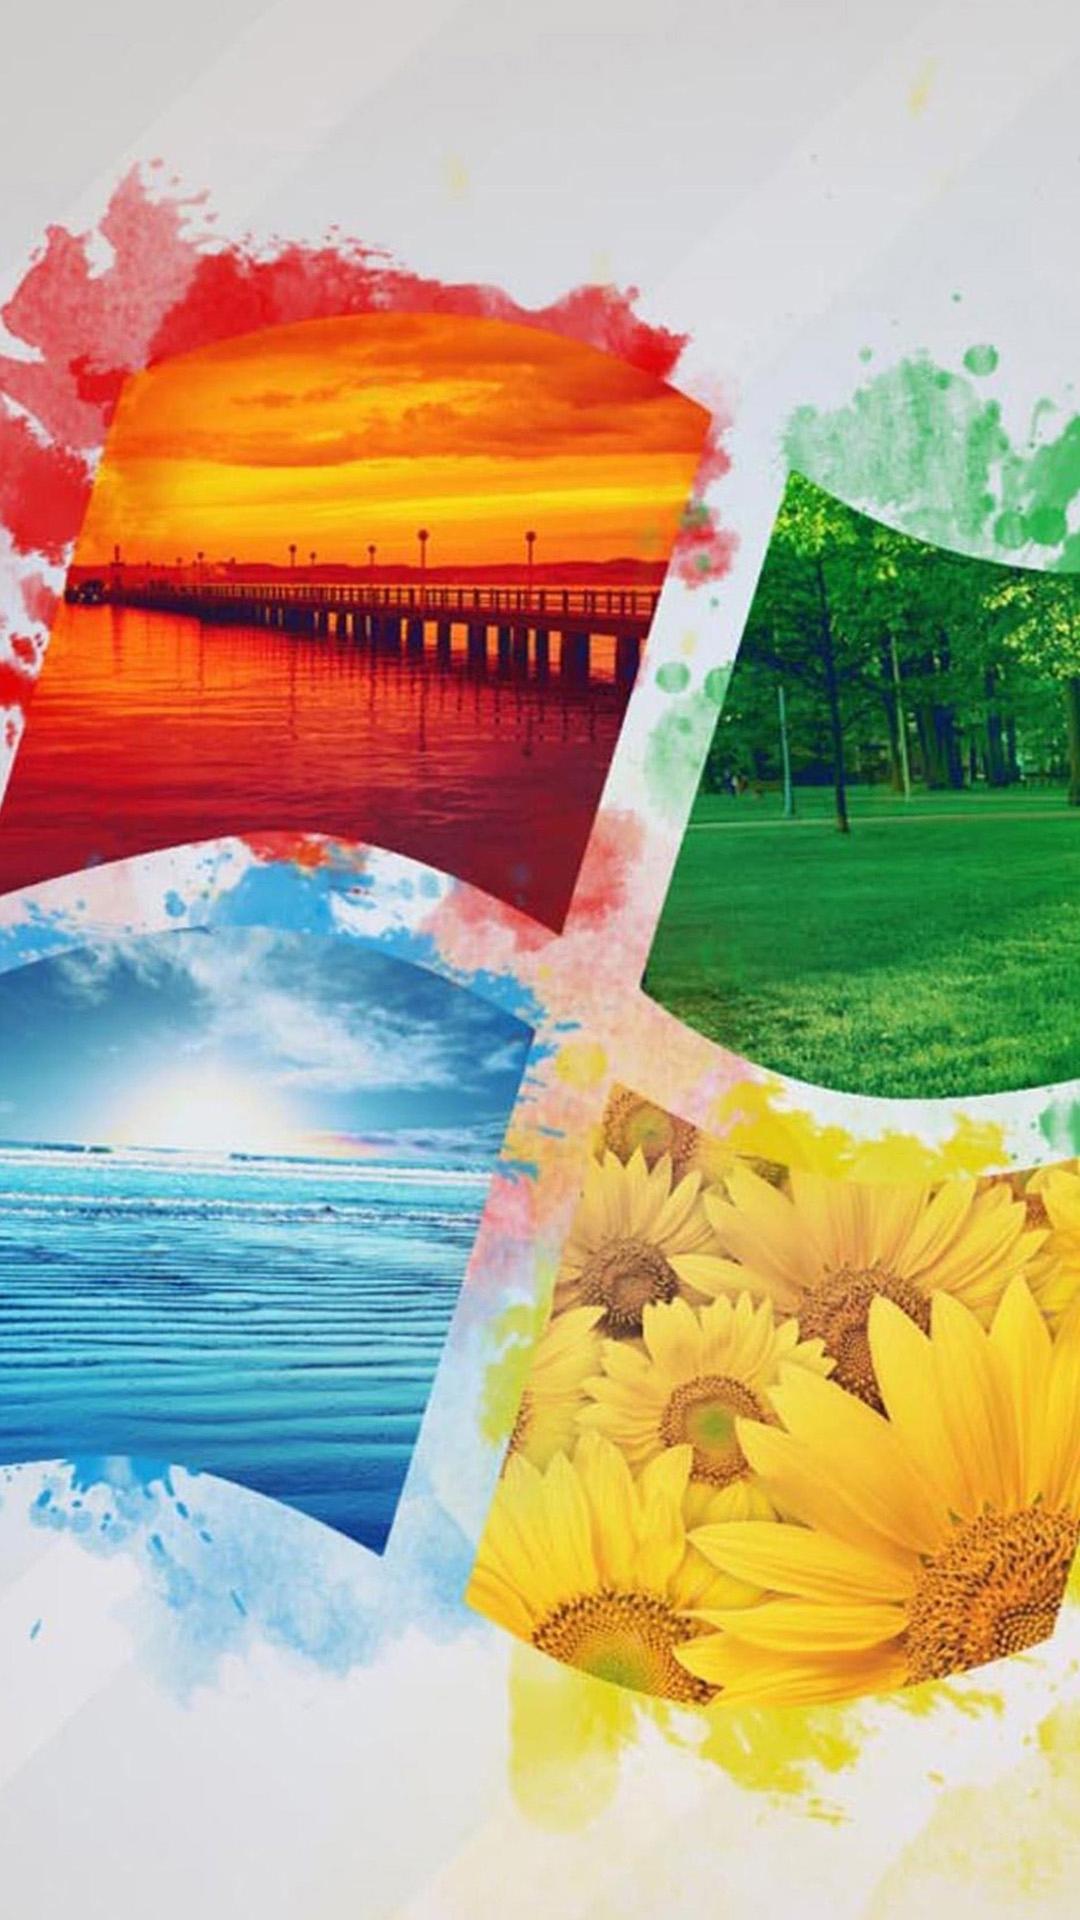 Color Moto X Windows Landscapes Android Wallpaper - Nature Windows 10 Wallpaper Hd , HD Wallpaper & Backgrounds